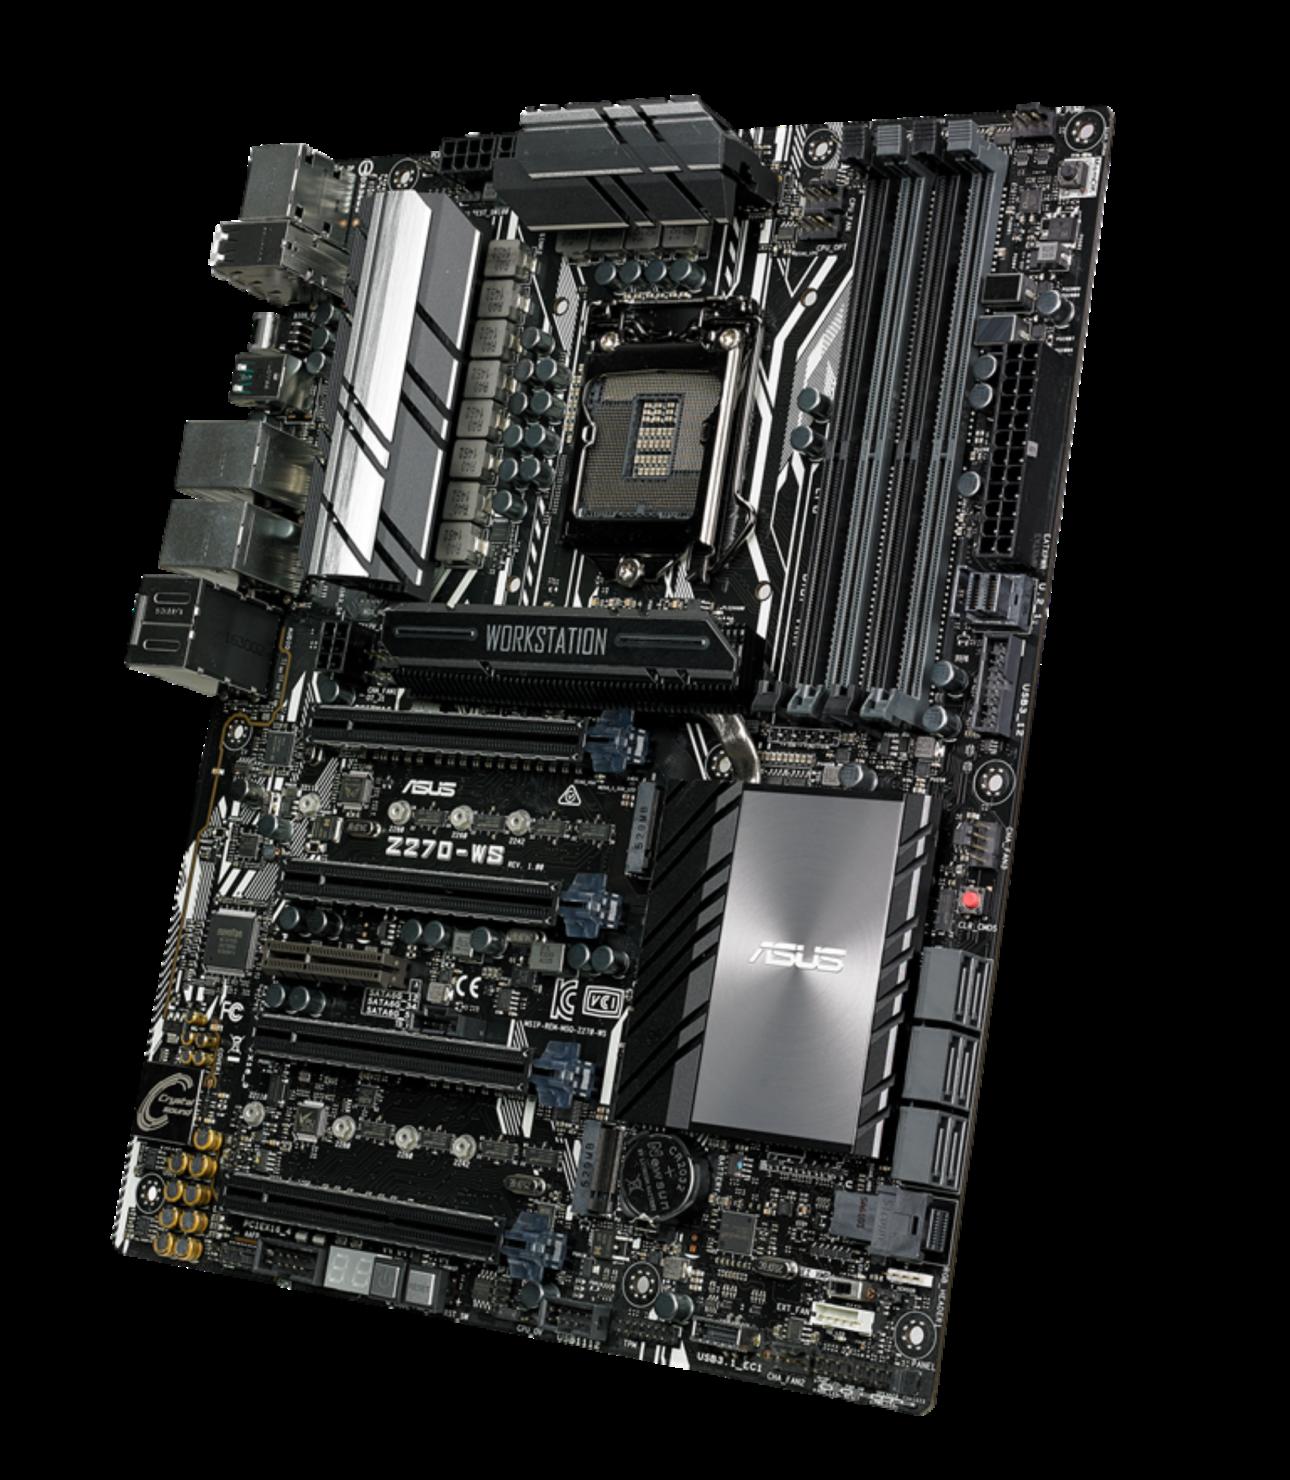 asus-z270-ws-workstation-motherboard-custom